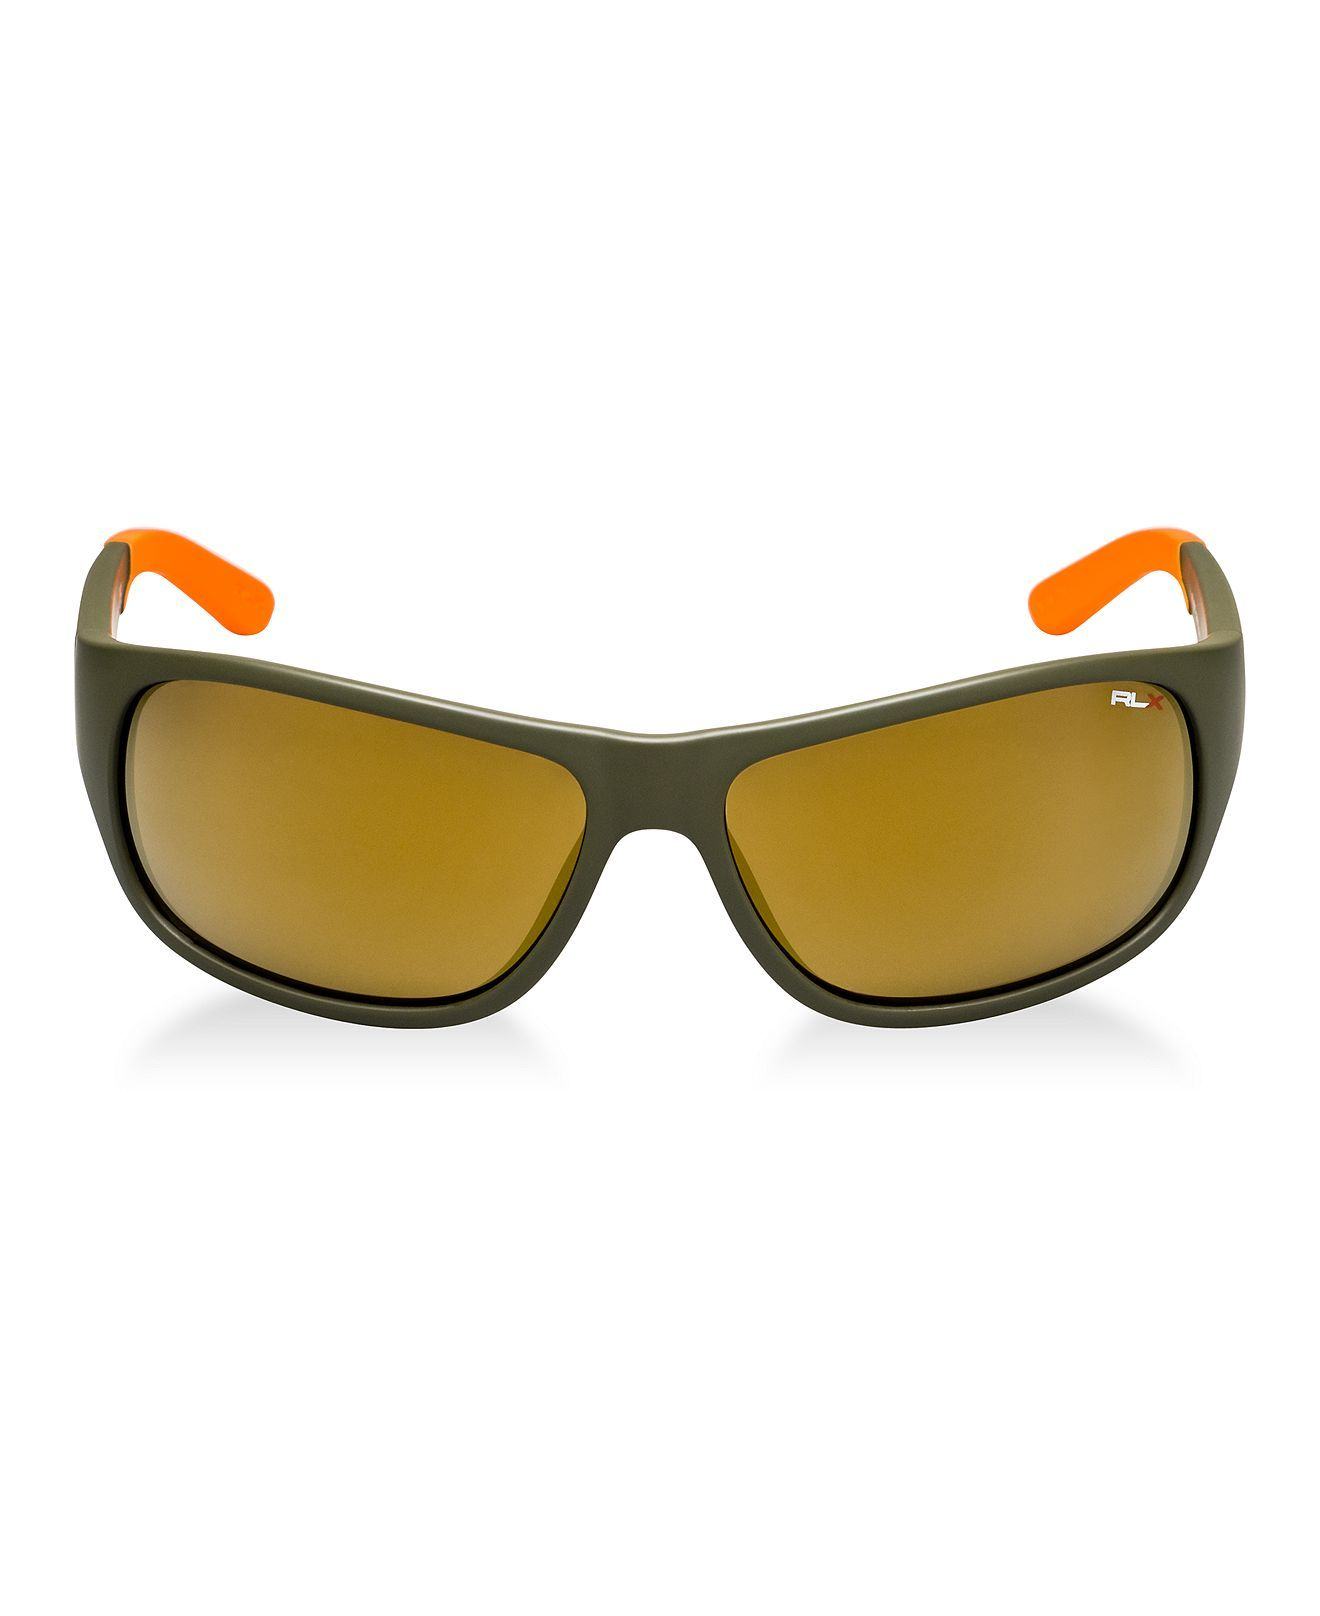 54136339fb64 Ralph Lauren RLX Sunglasses | EYEWEAR | Ralph lauren, Sunglasses ...